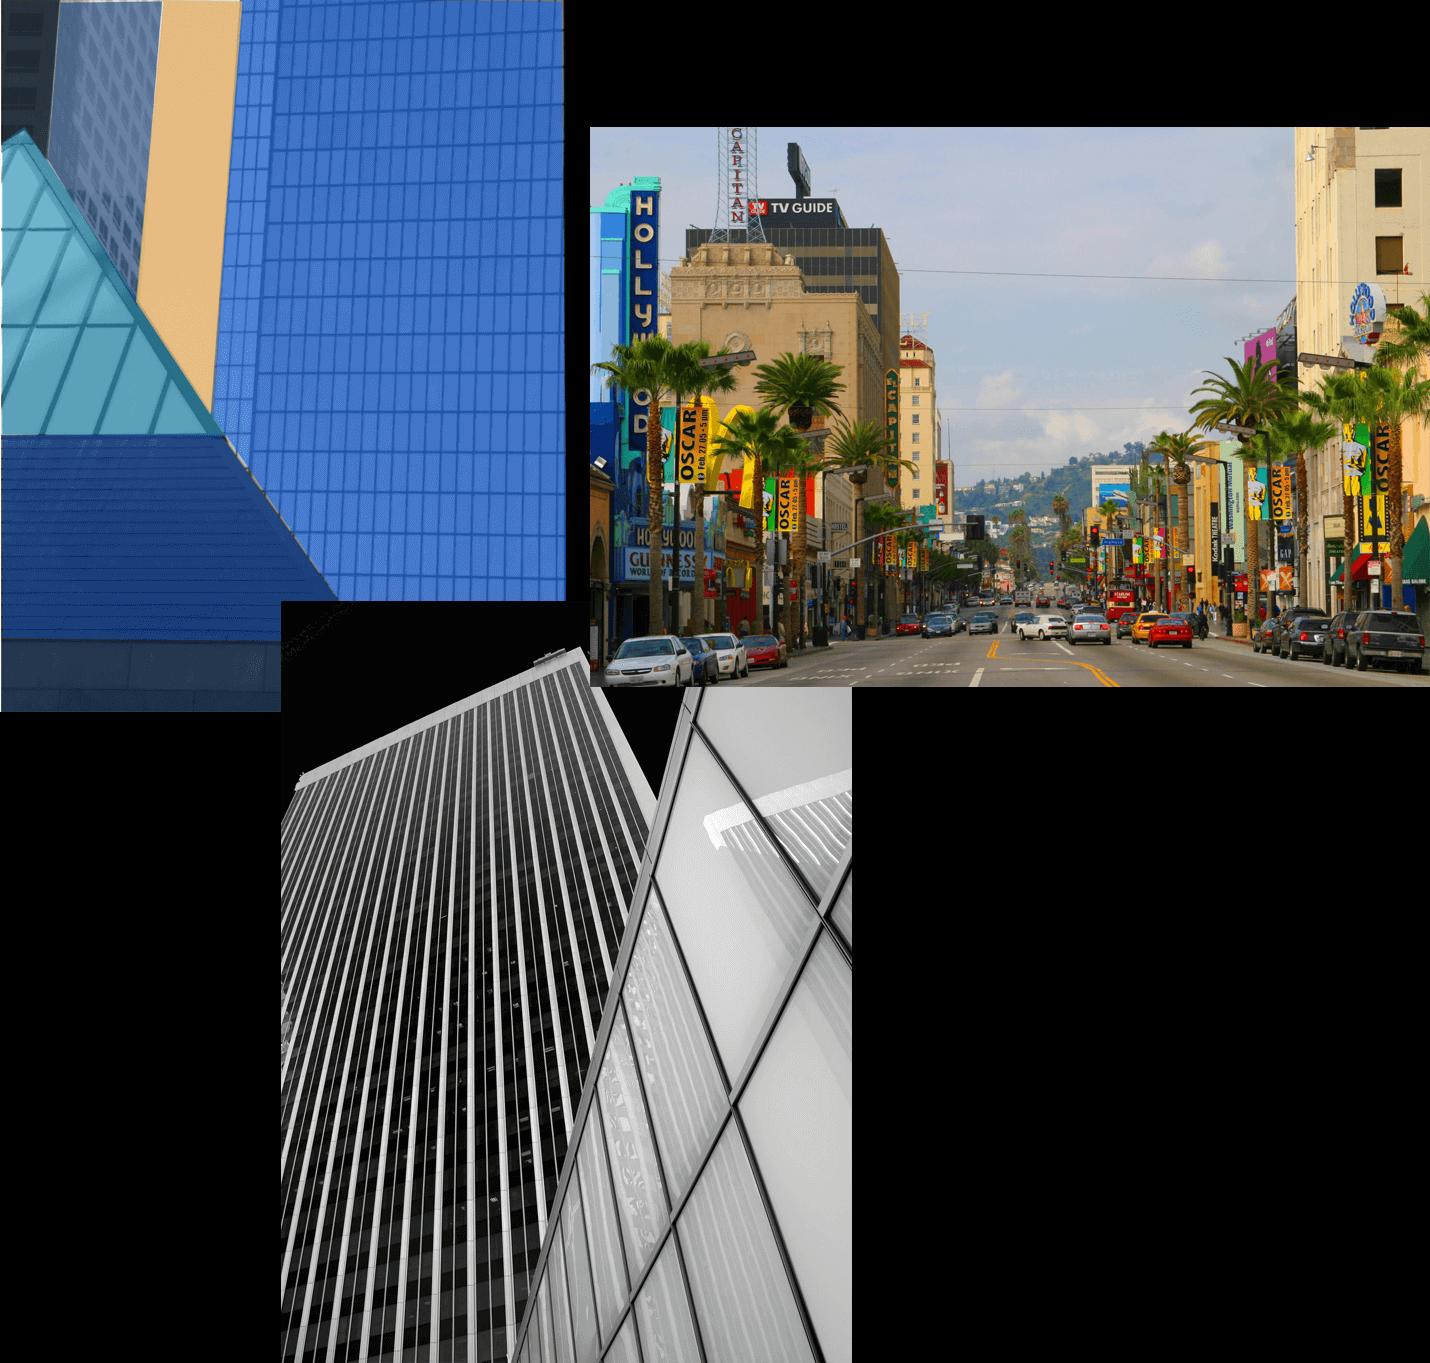 qwk-urban-comp1.png